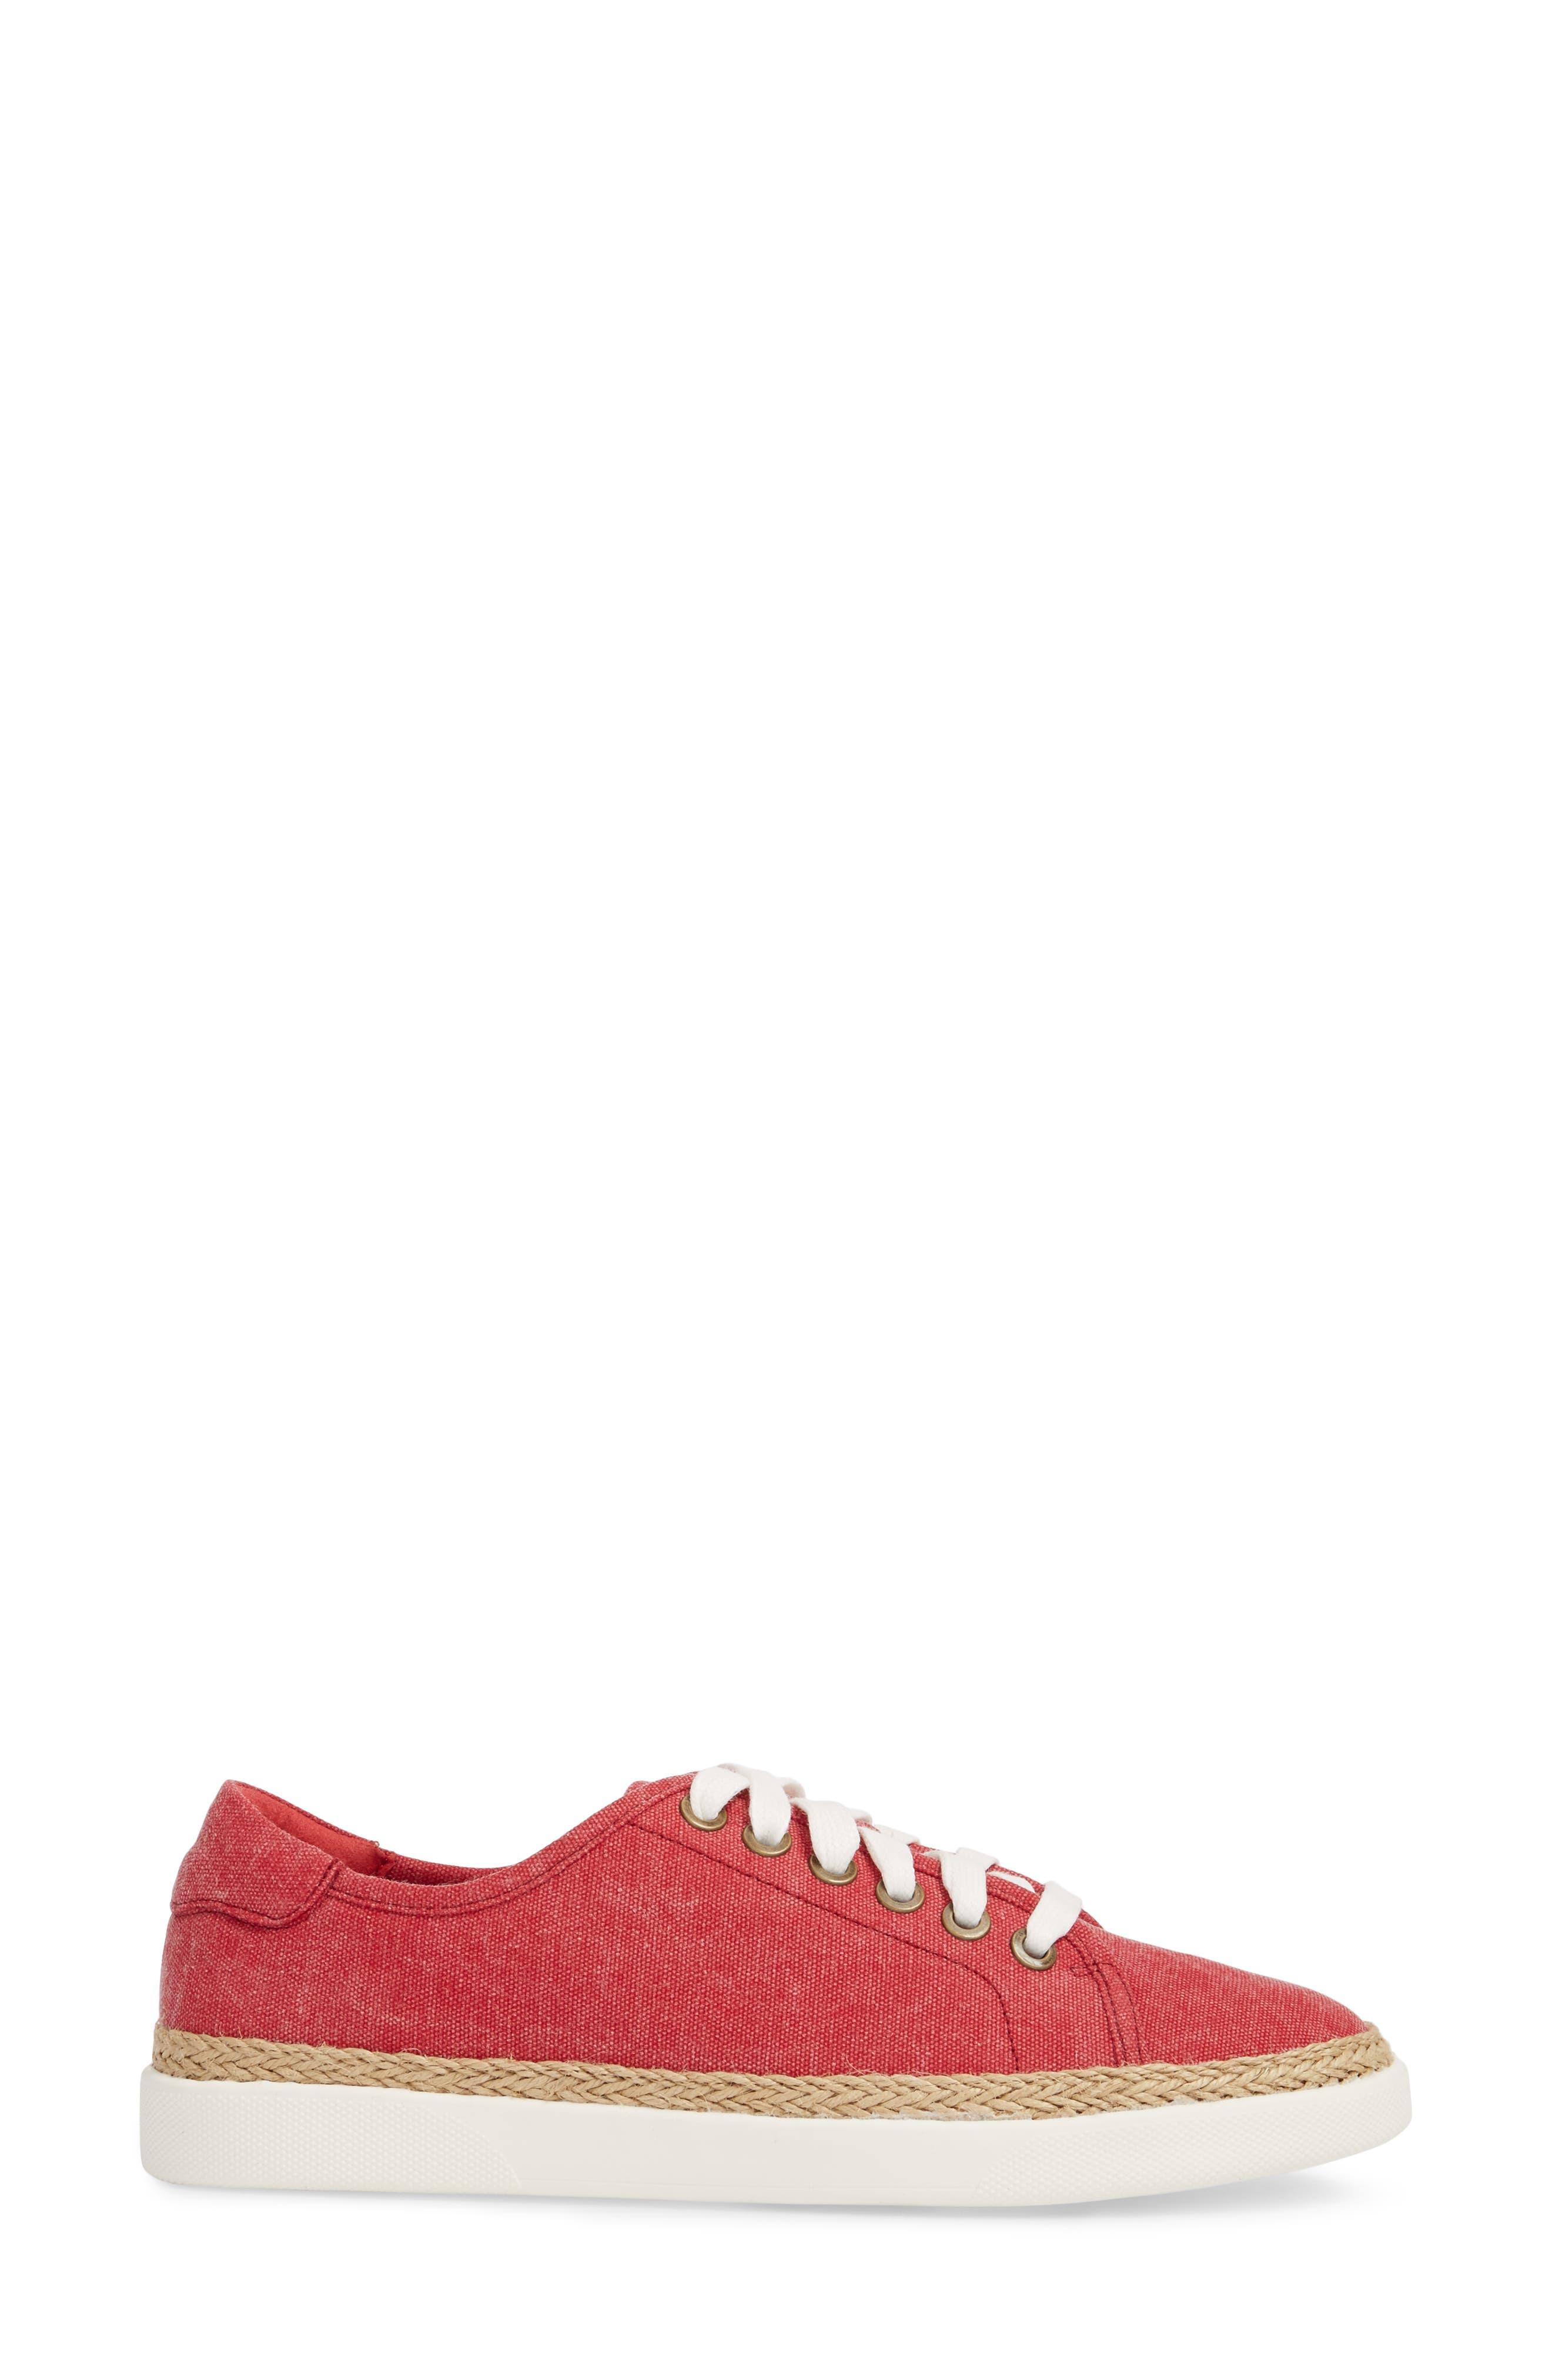 Hattie Sneaker,                             Alternate thumbnail 12, color,